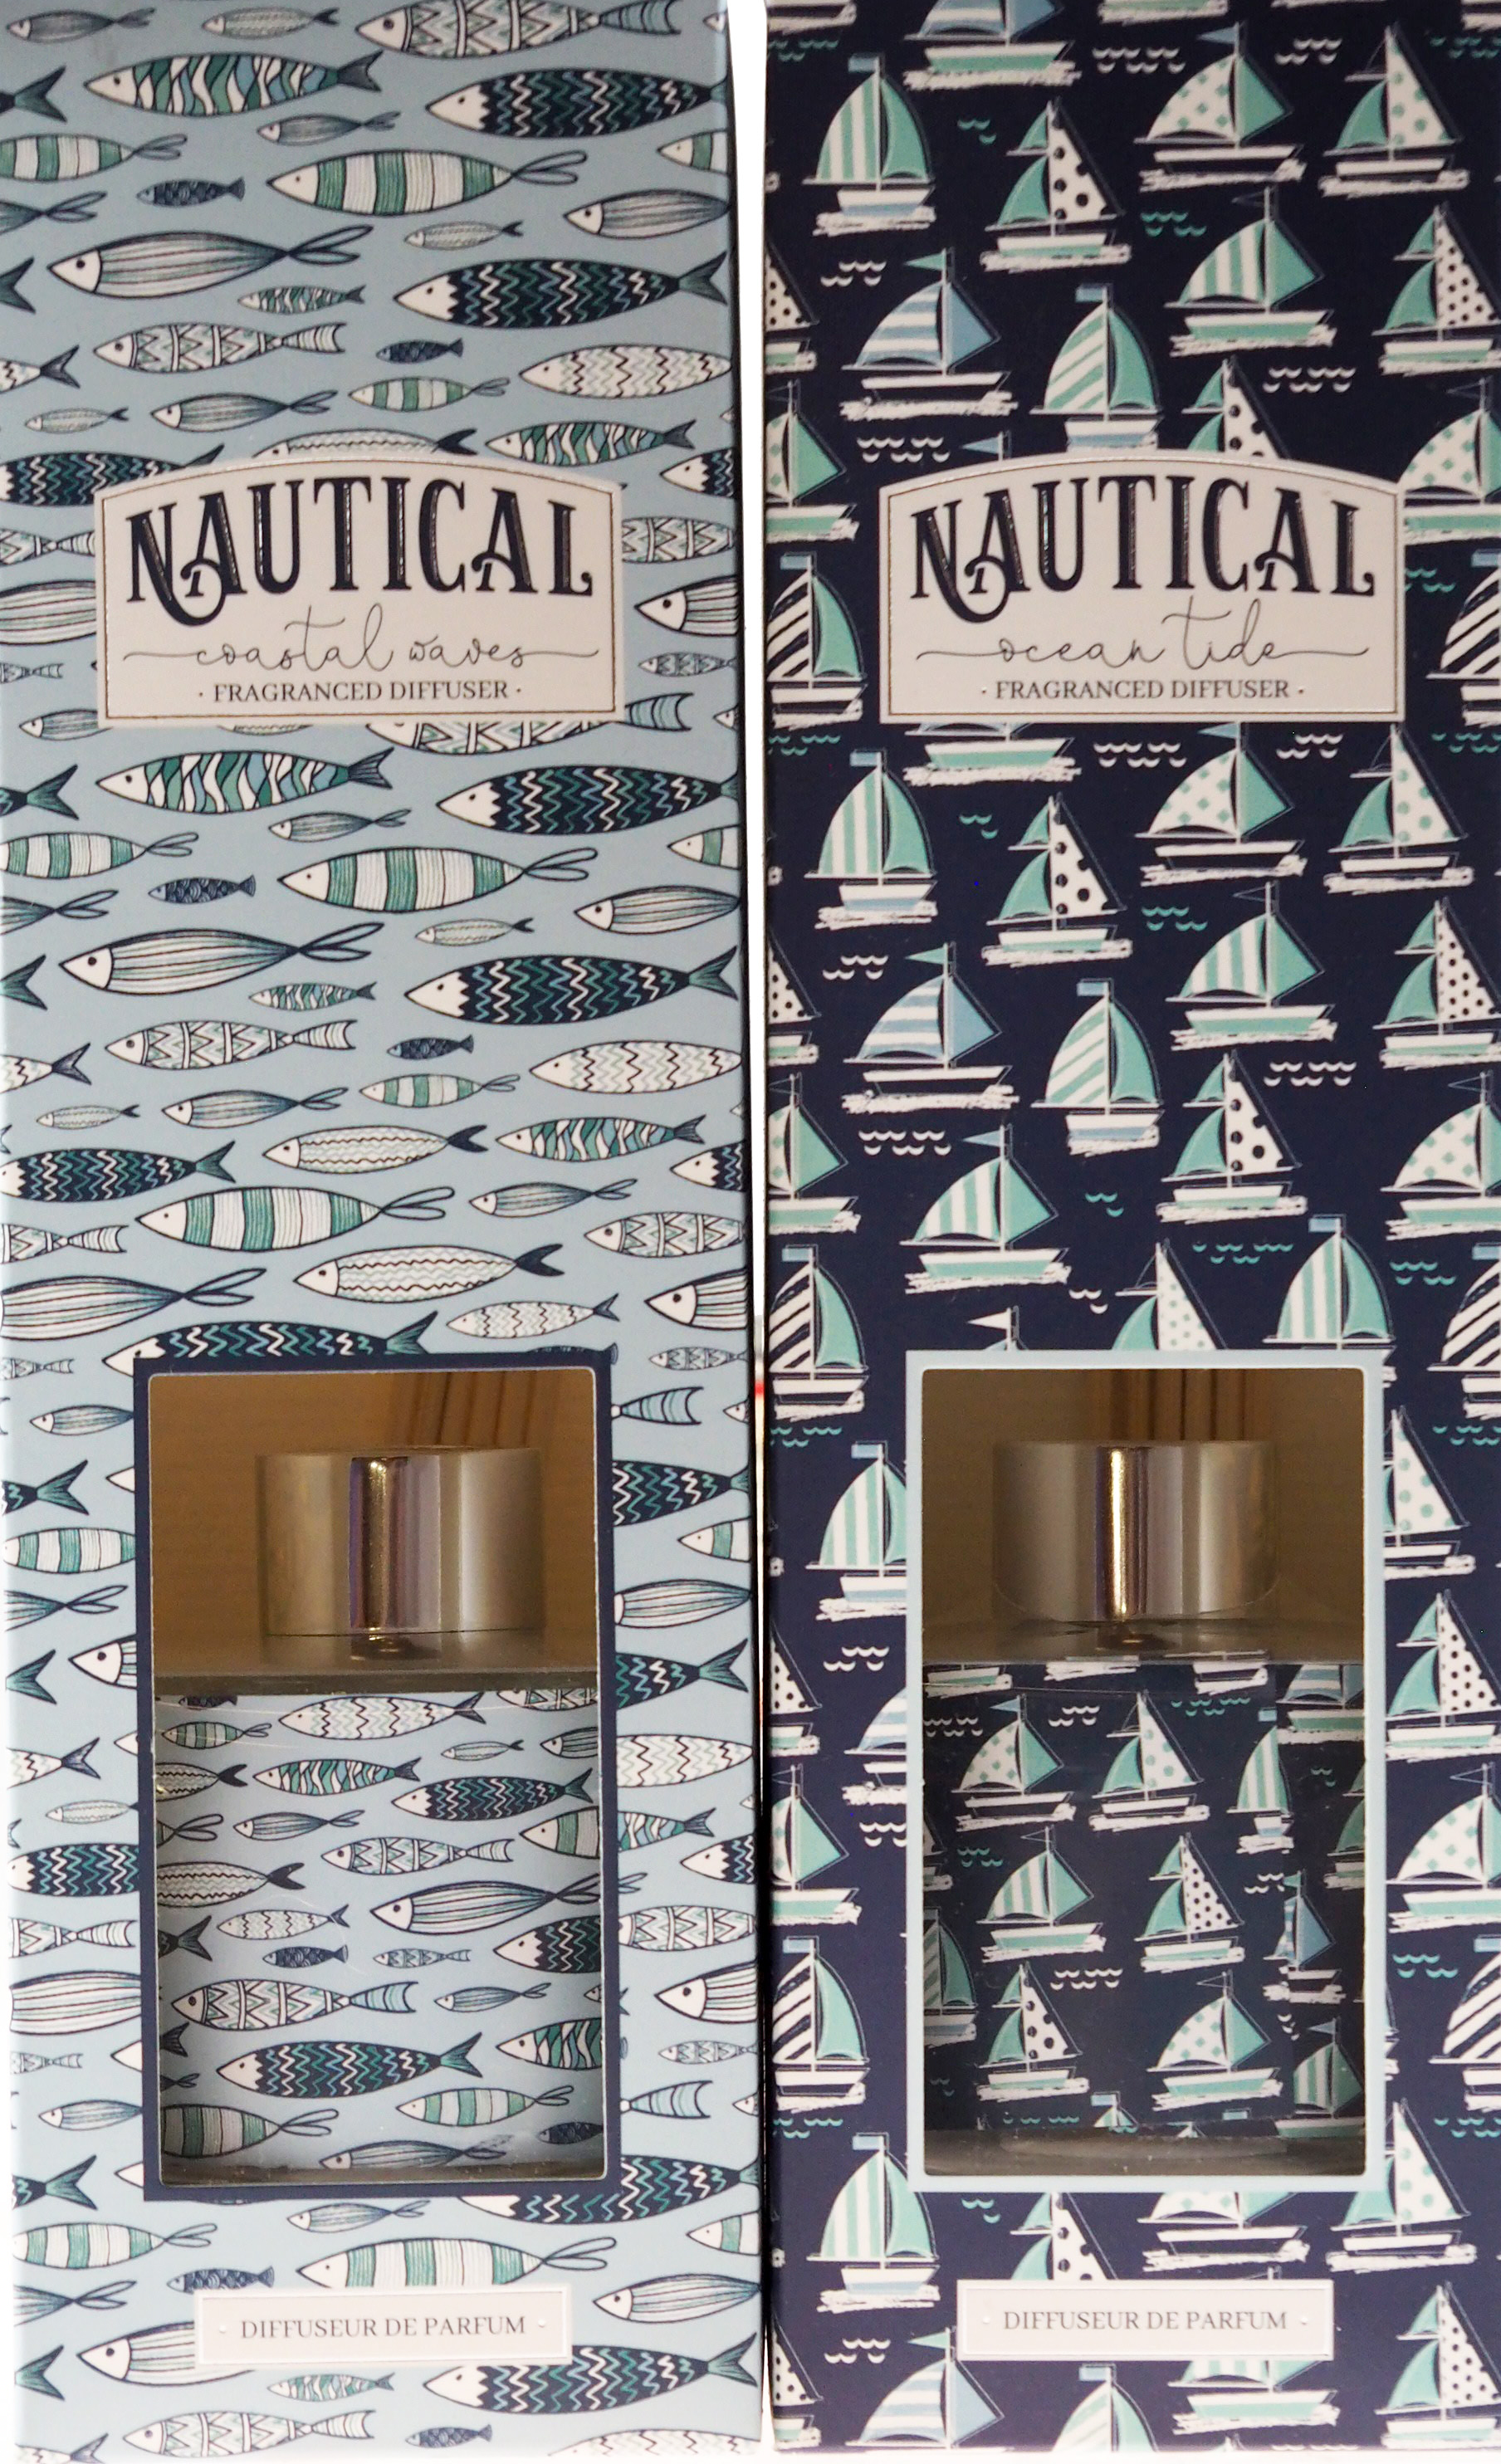 Set Of 2 Nautical Coastal Waves Ocean Tide 100ml Reed Diffuser In Gift Box Ebay